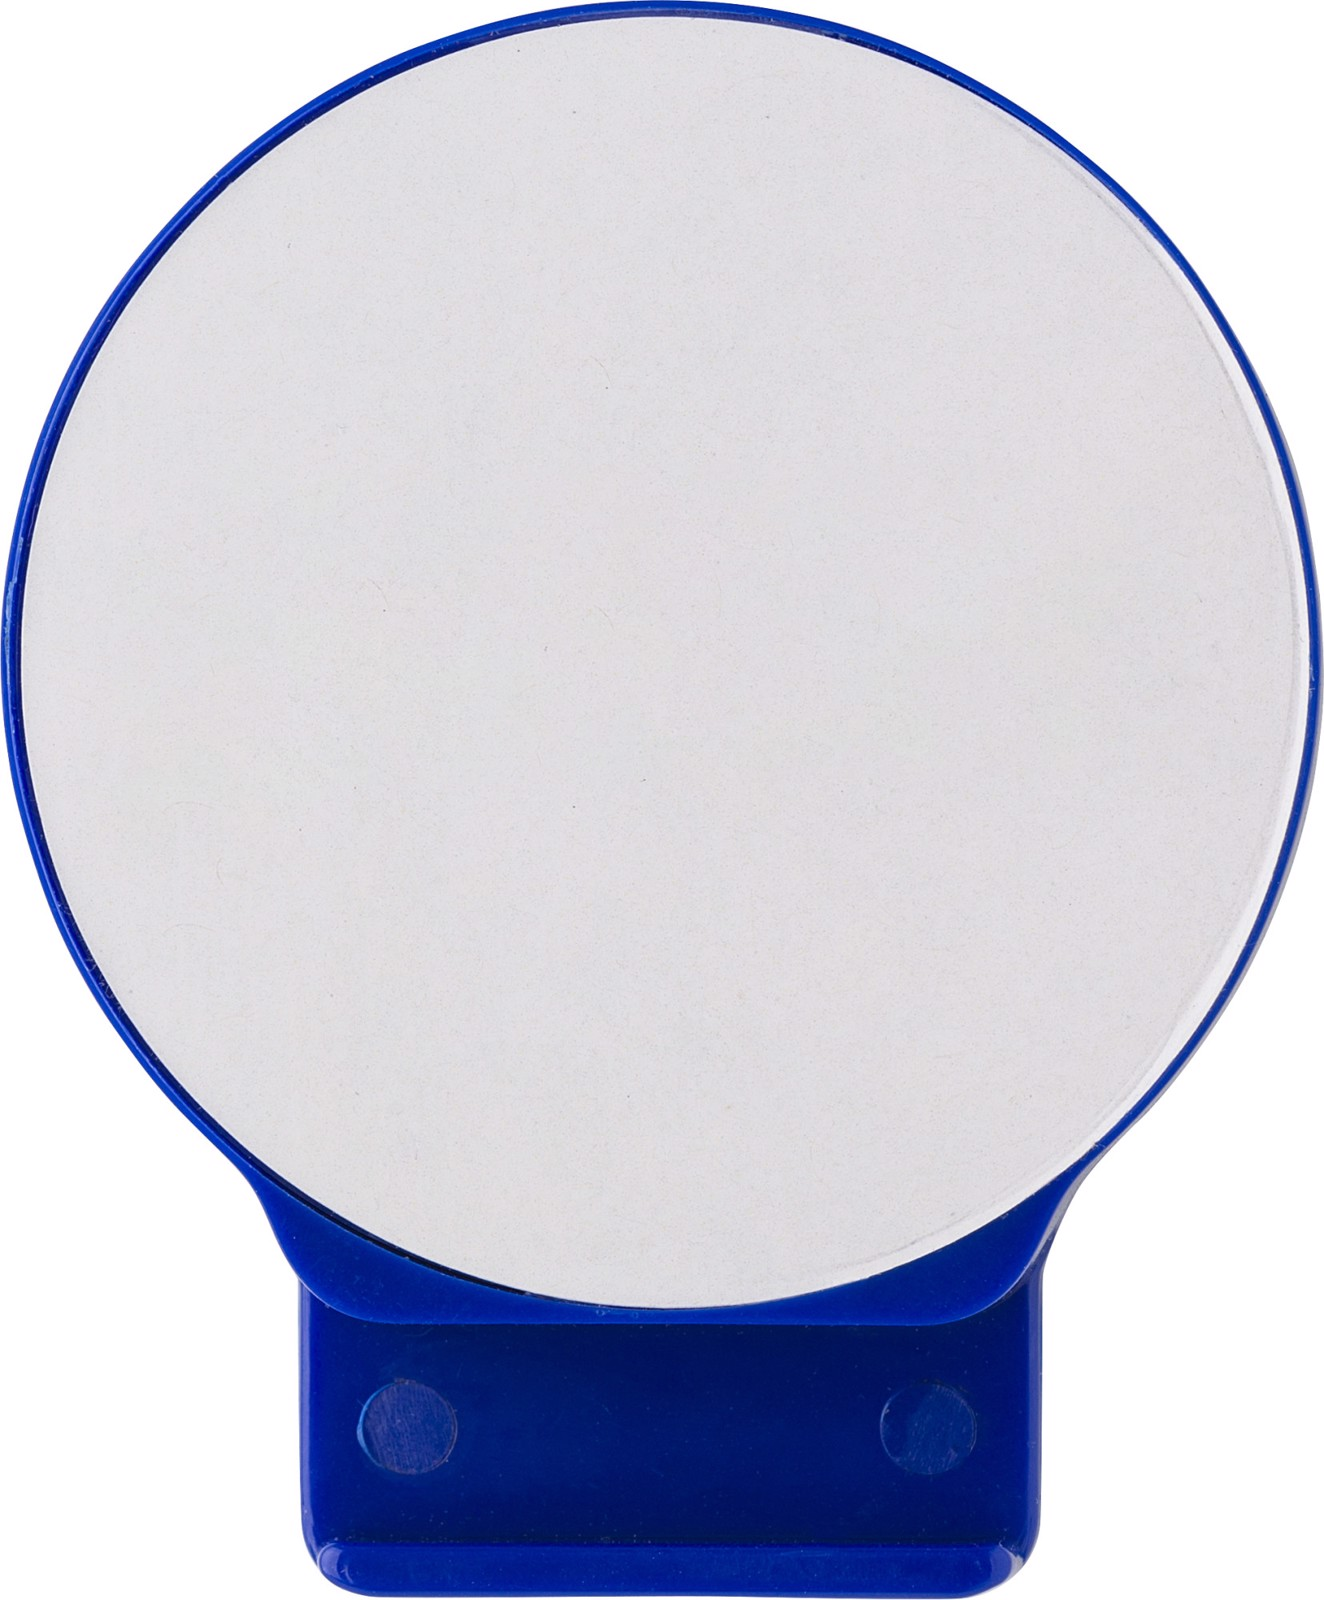 ABS pen holder with ballpen - Blue